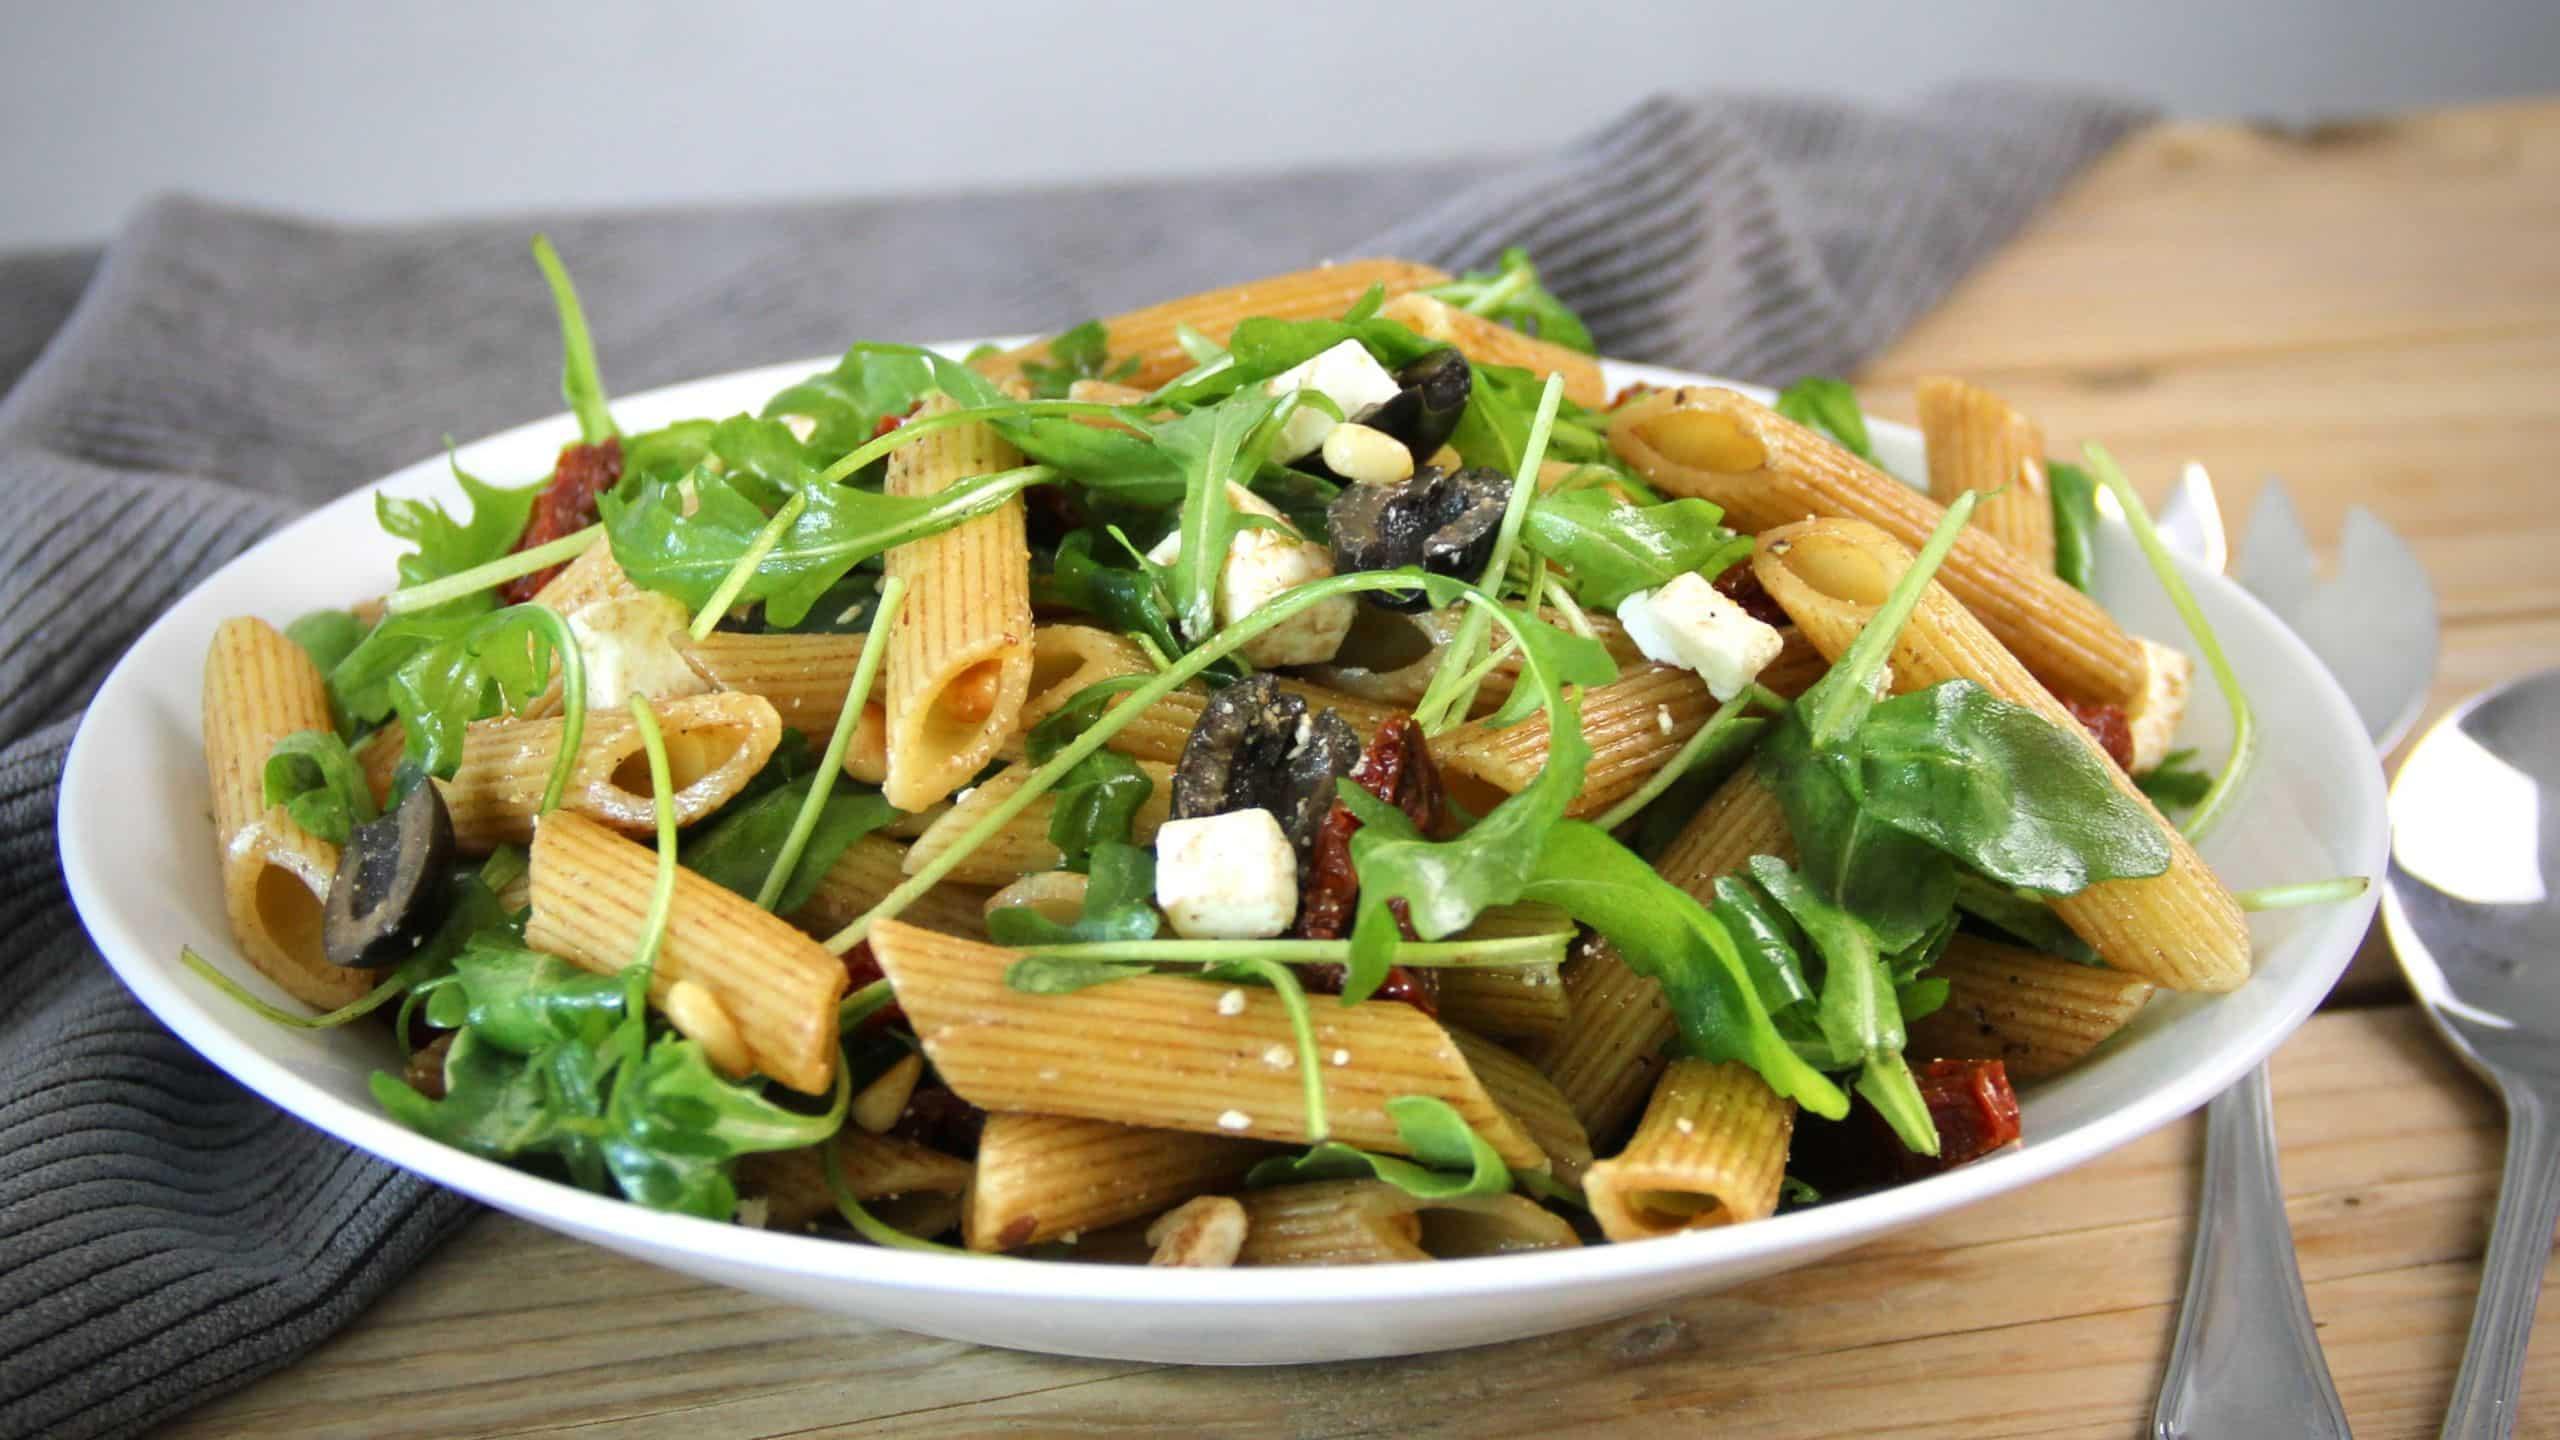 Makkelijke pastasalade met gedroogde tomaten en feta mei 2020 1